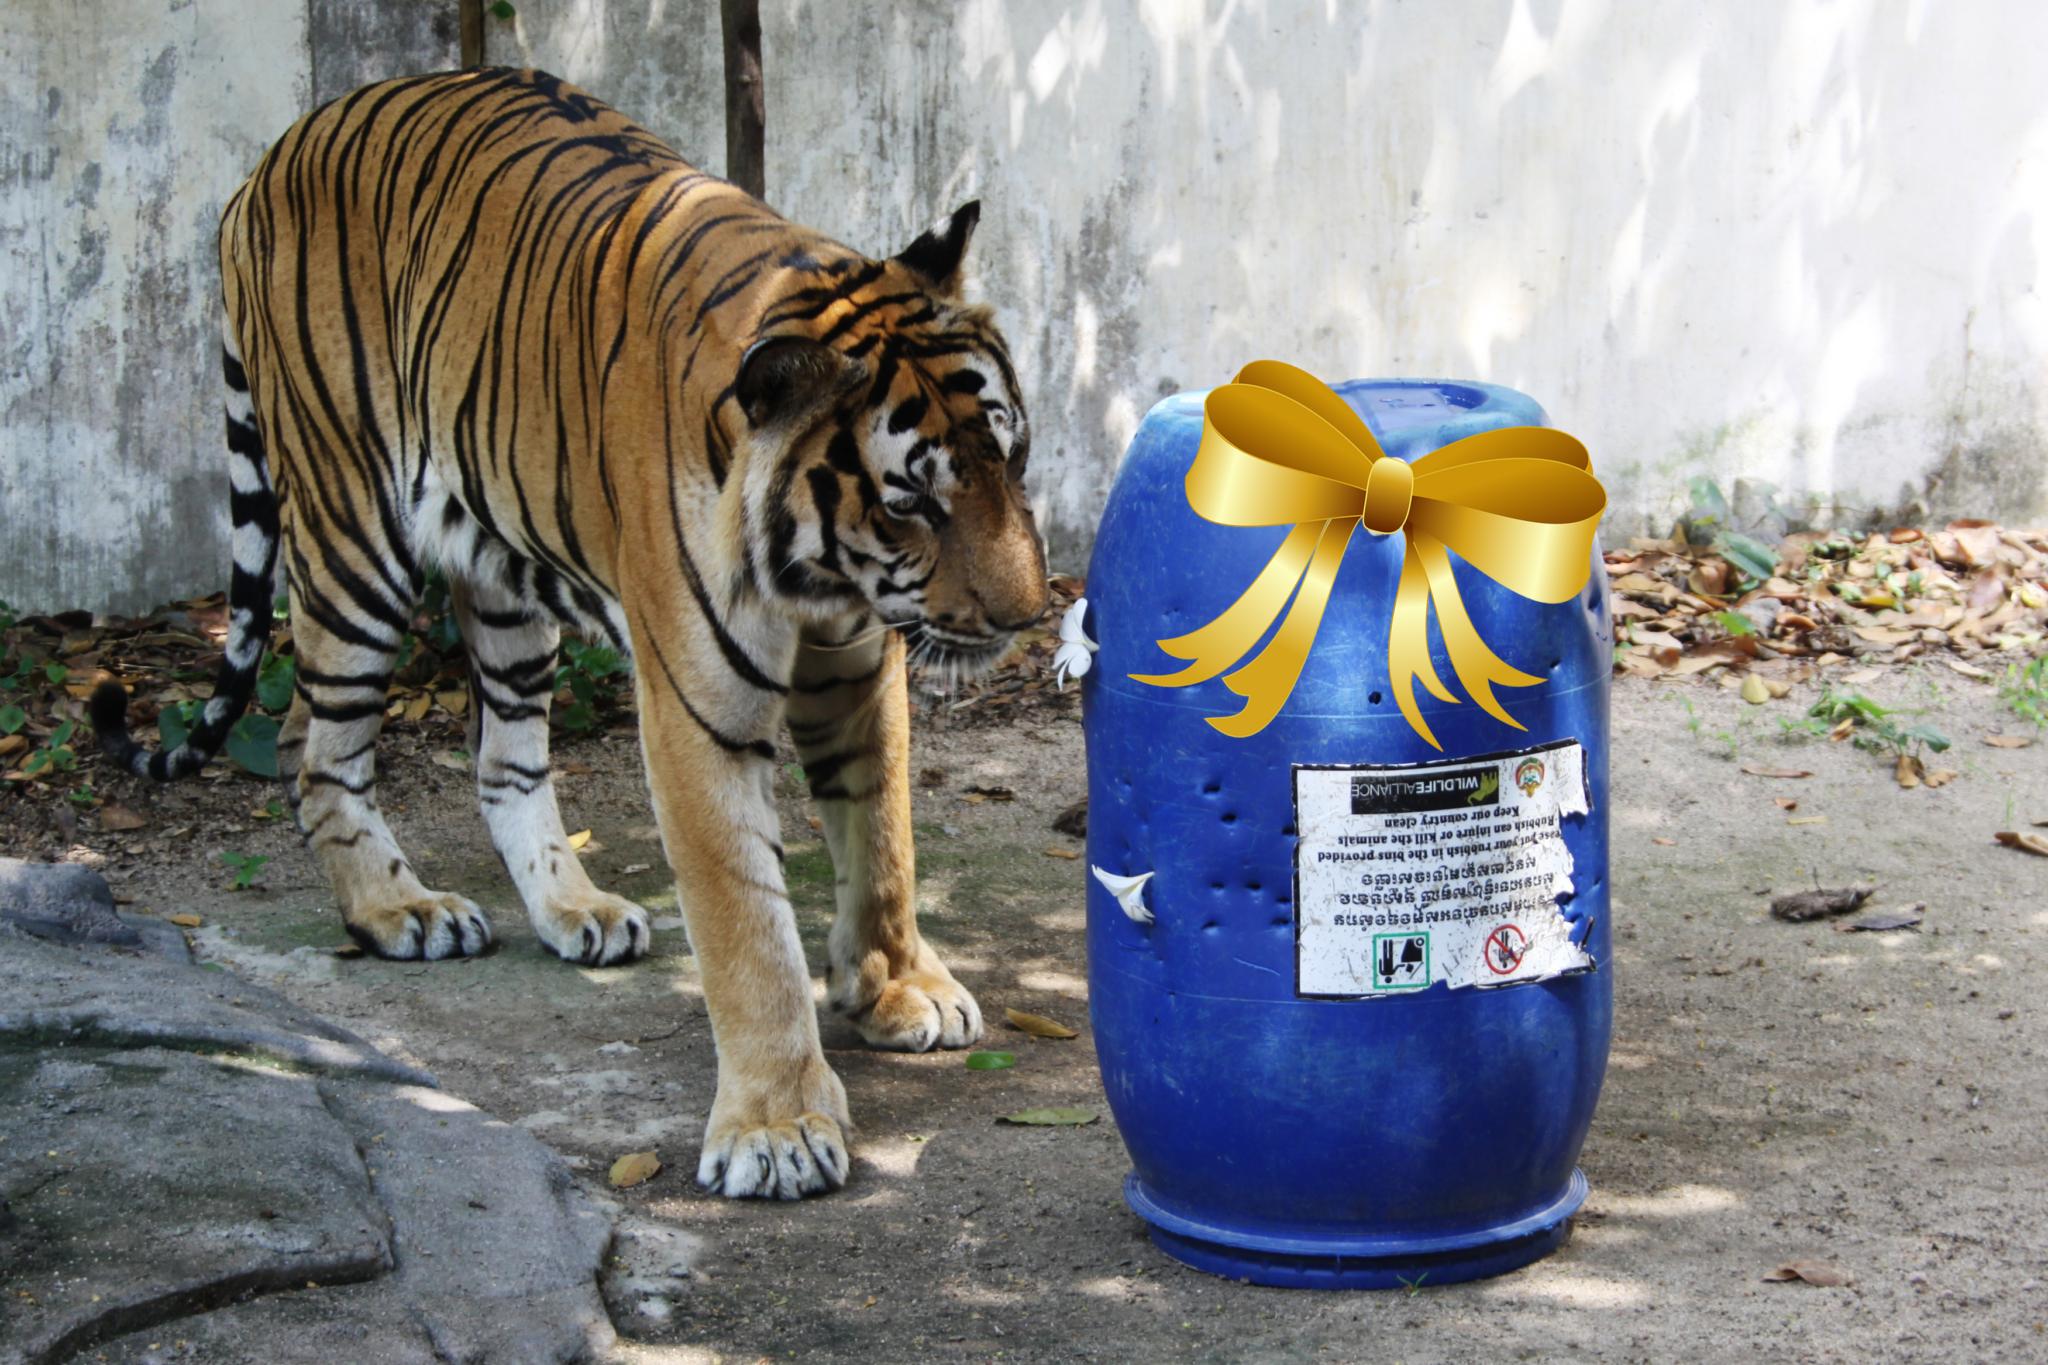 Tiger with barrel enrichment Wildlife Alliance Cambodia Phnom Tamao Wildlife Rescue Centre git bow Mother's Day 2021